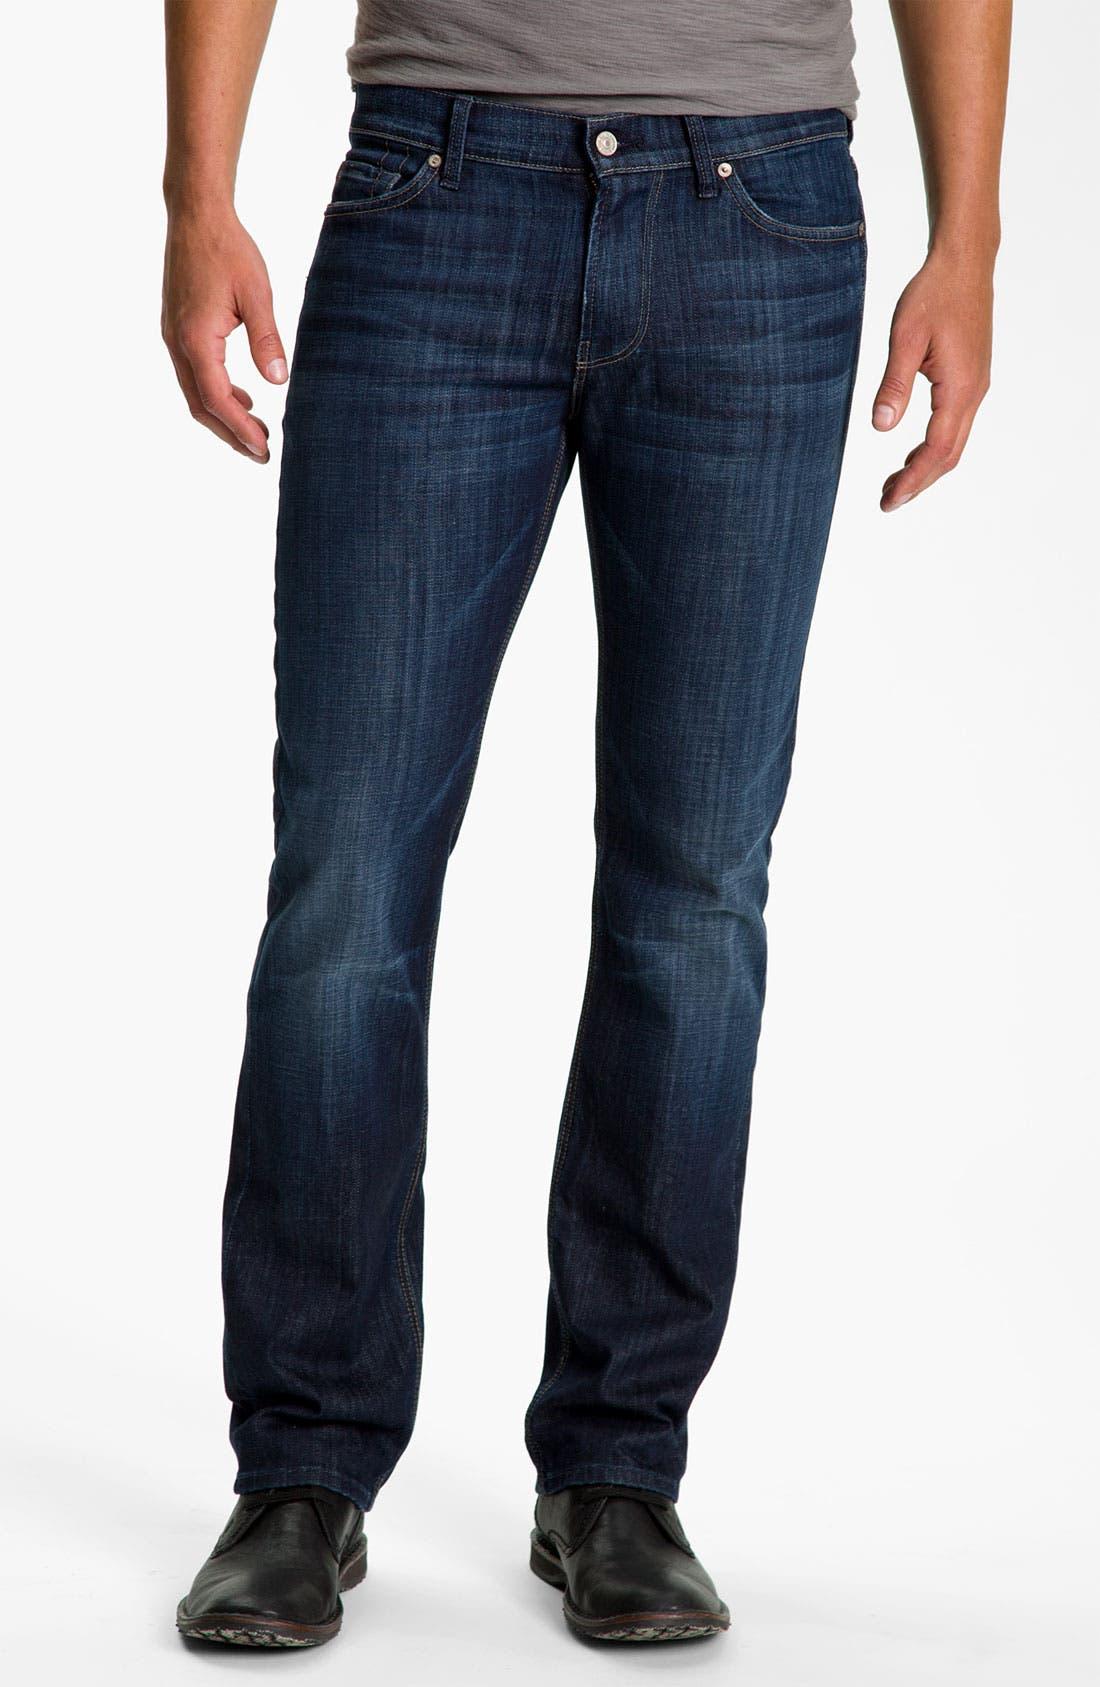 Slimmy Slim Fit Jeans,                             Main thumbnail 1, color,                             LOS ANGELES DARK